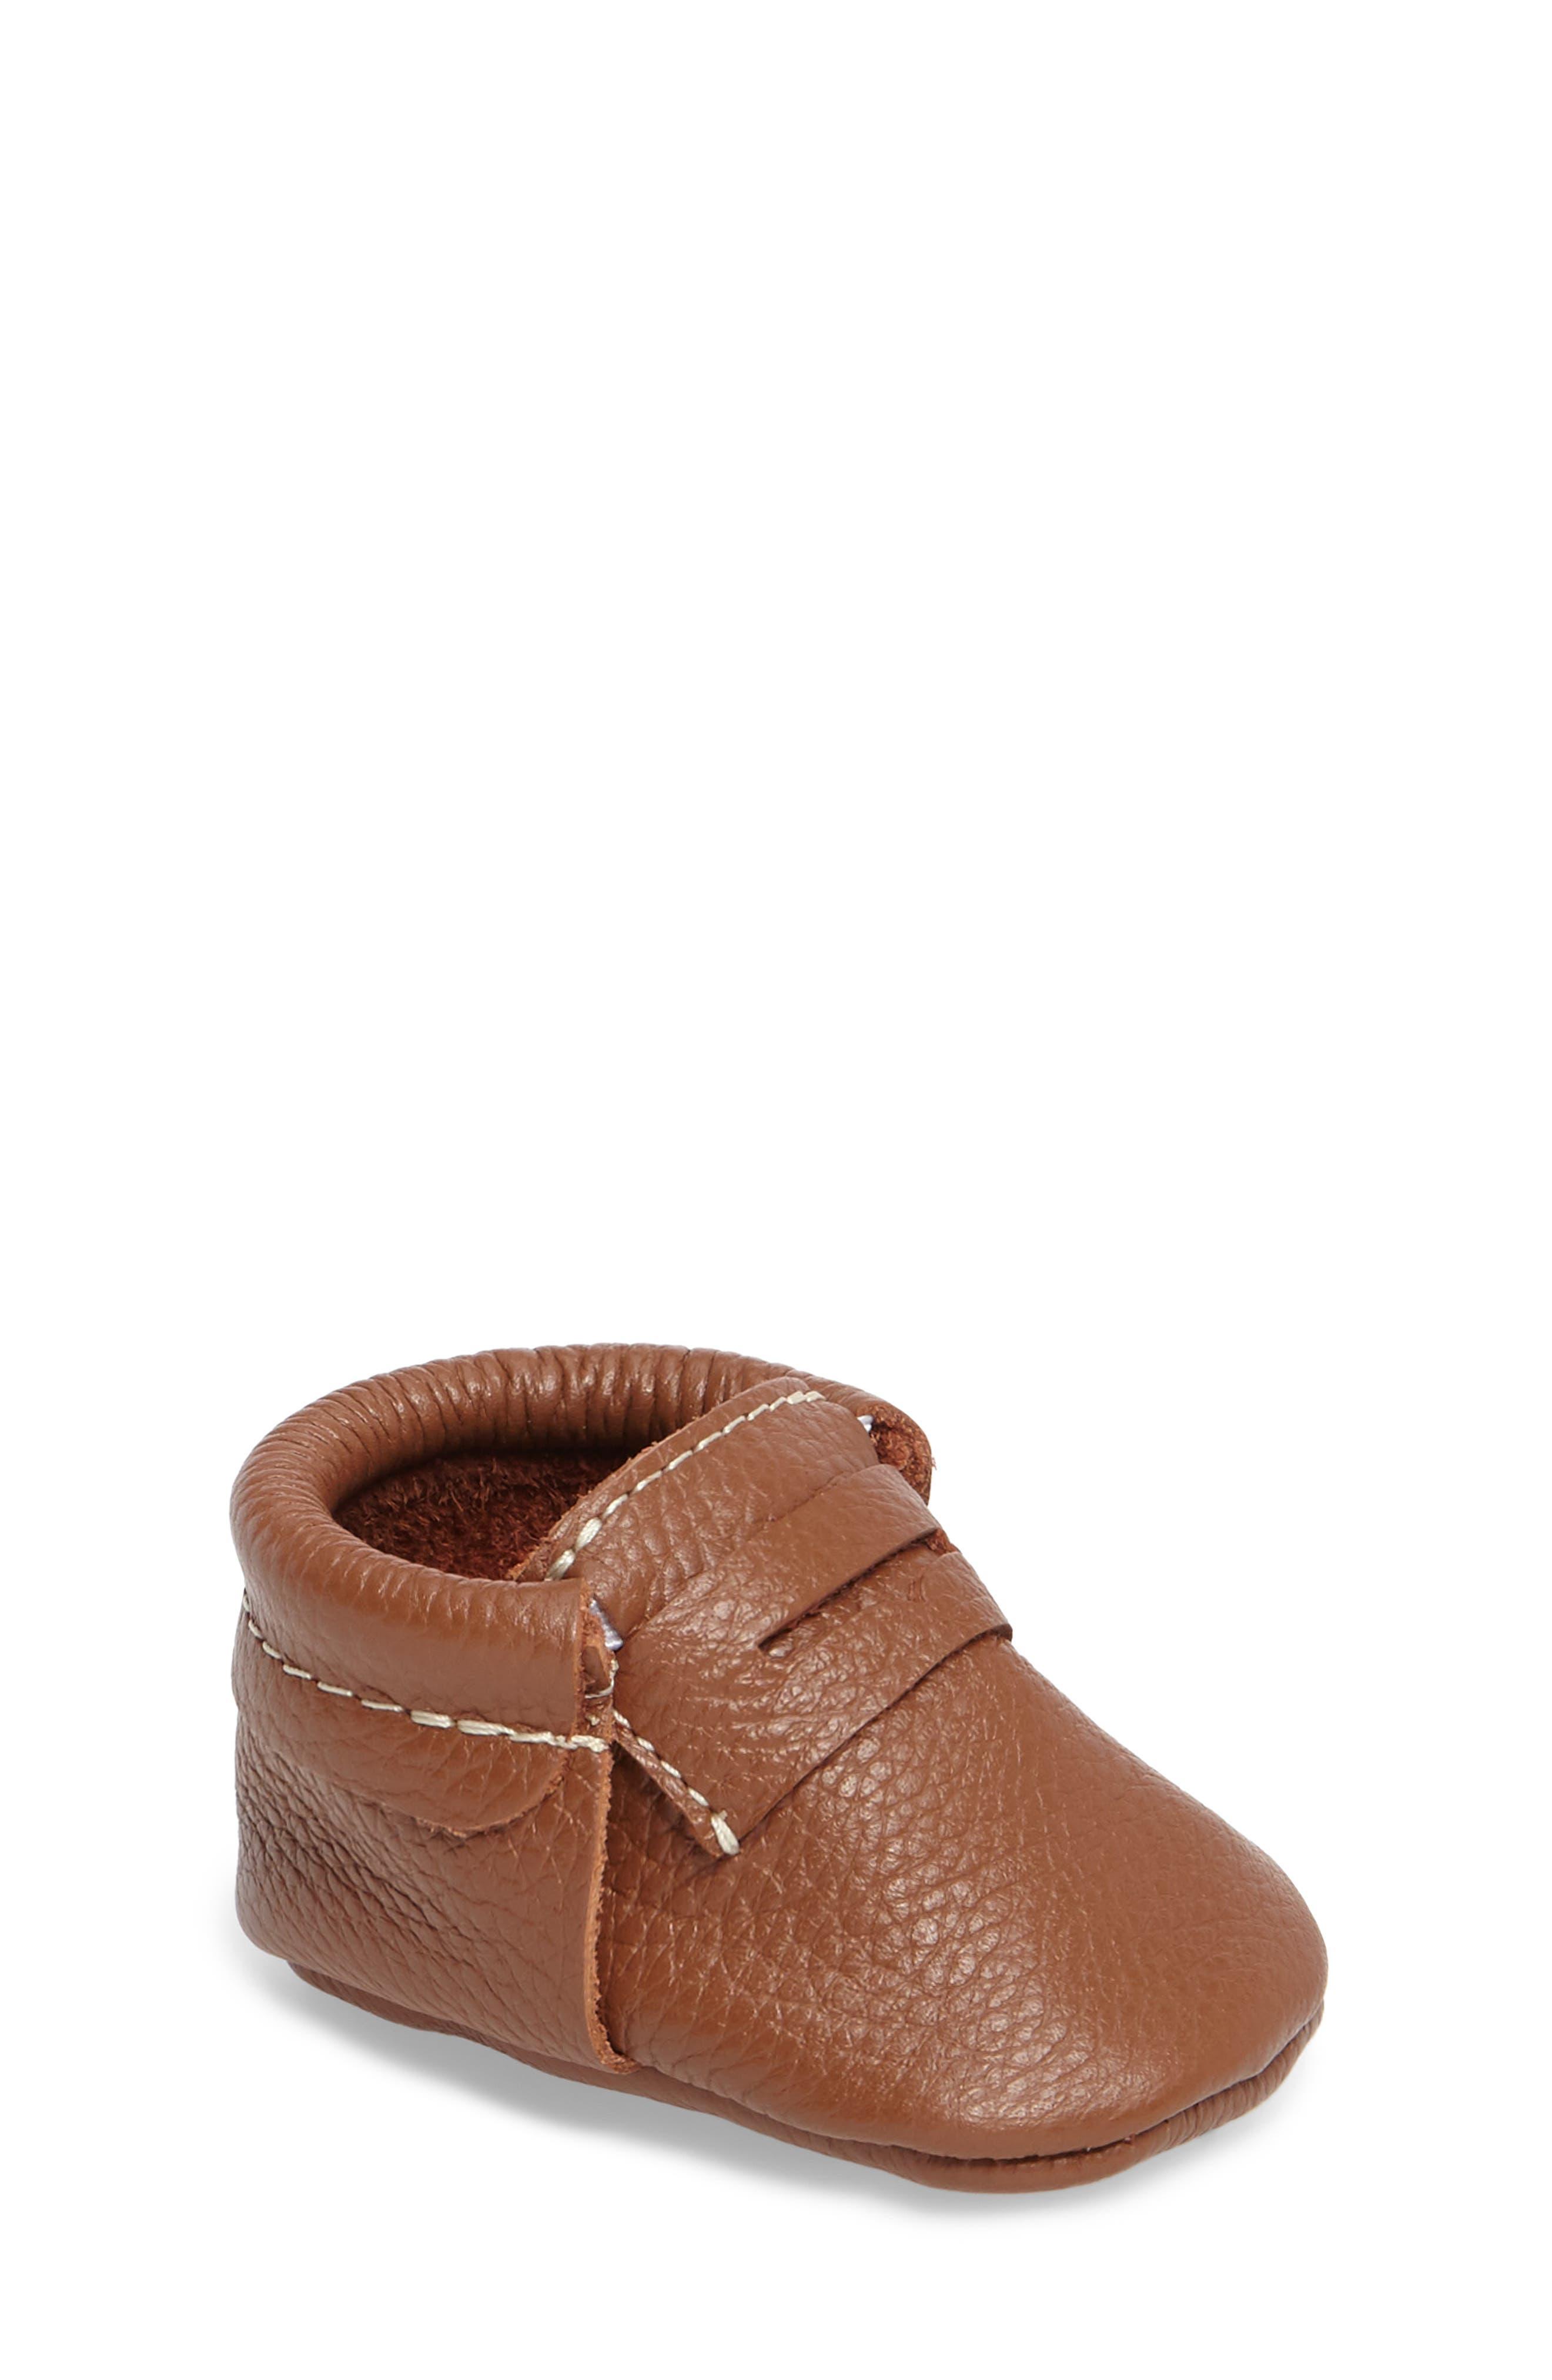 Penny Loafer Crib Shoe,                             Main thumbnail 1, color,                             Cognac